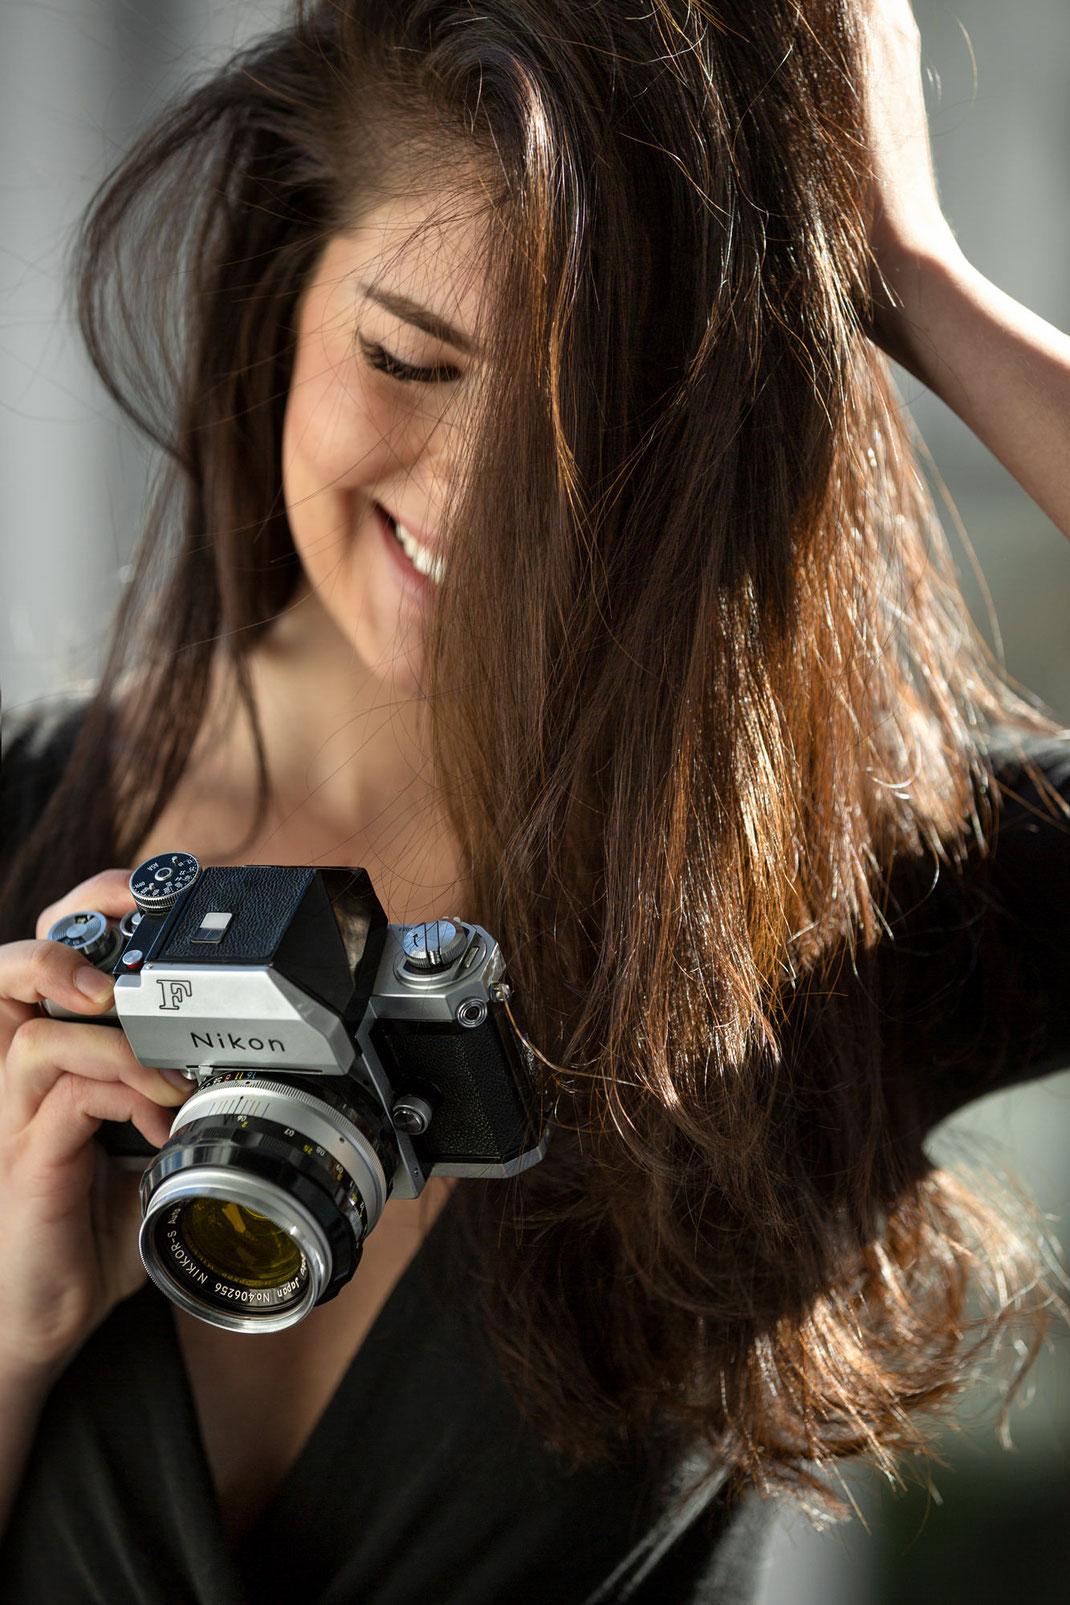 Two Beauties - Laura & Nikon F Photomic - Markus Hertzsch - Camera - Girl